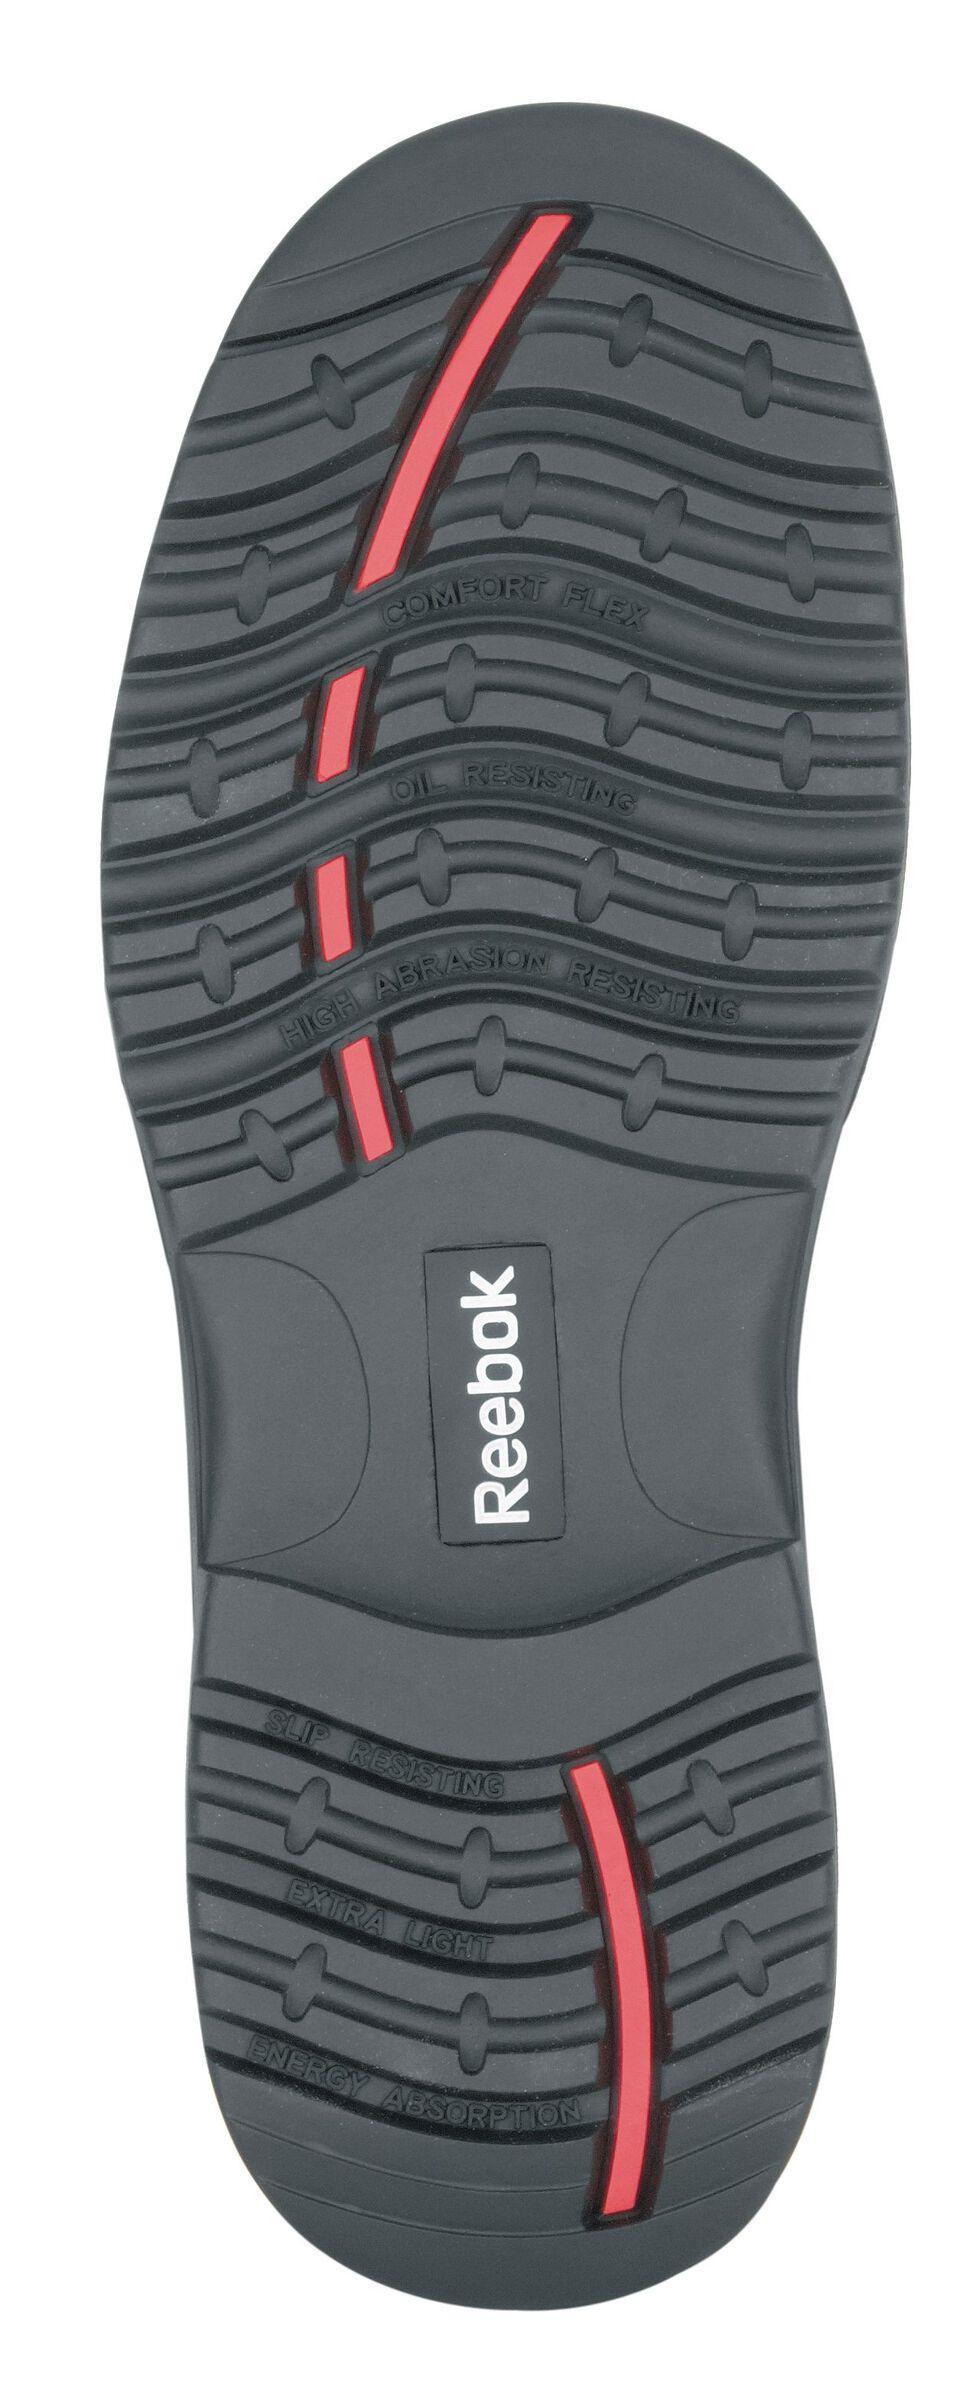 "Reebok Men's Trainex 6"" Lace-Up Internal Met Guard Work Boots - Composite Toe, Black, hi-res"